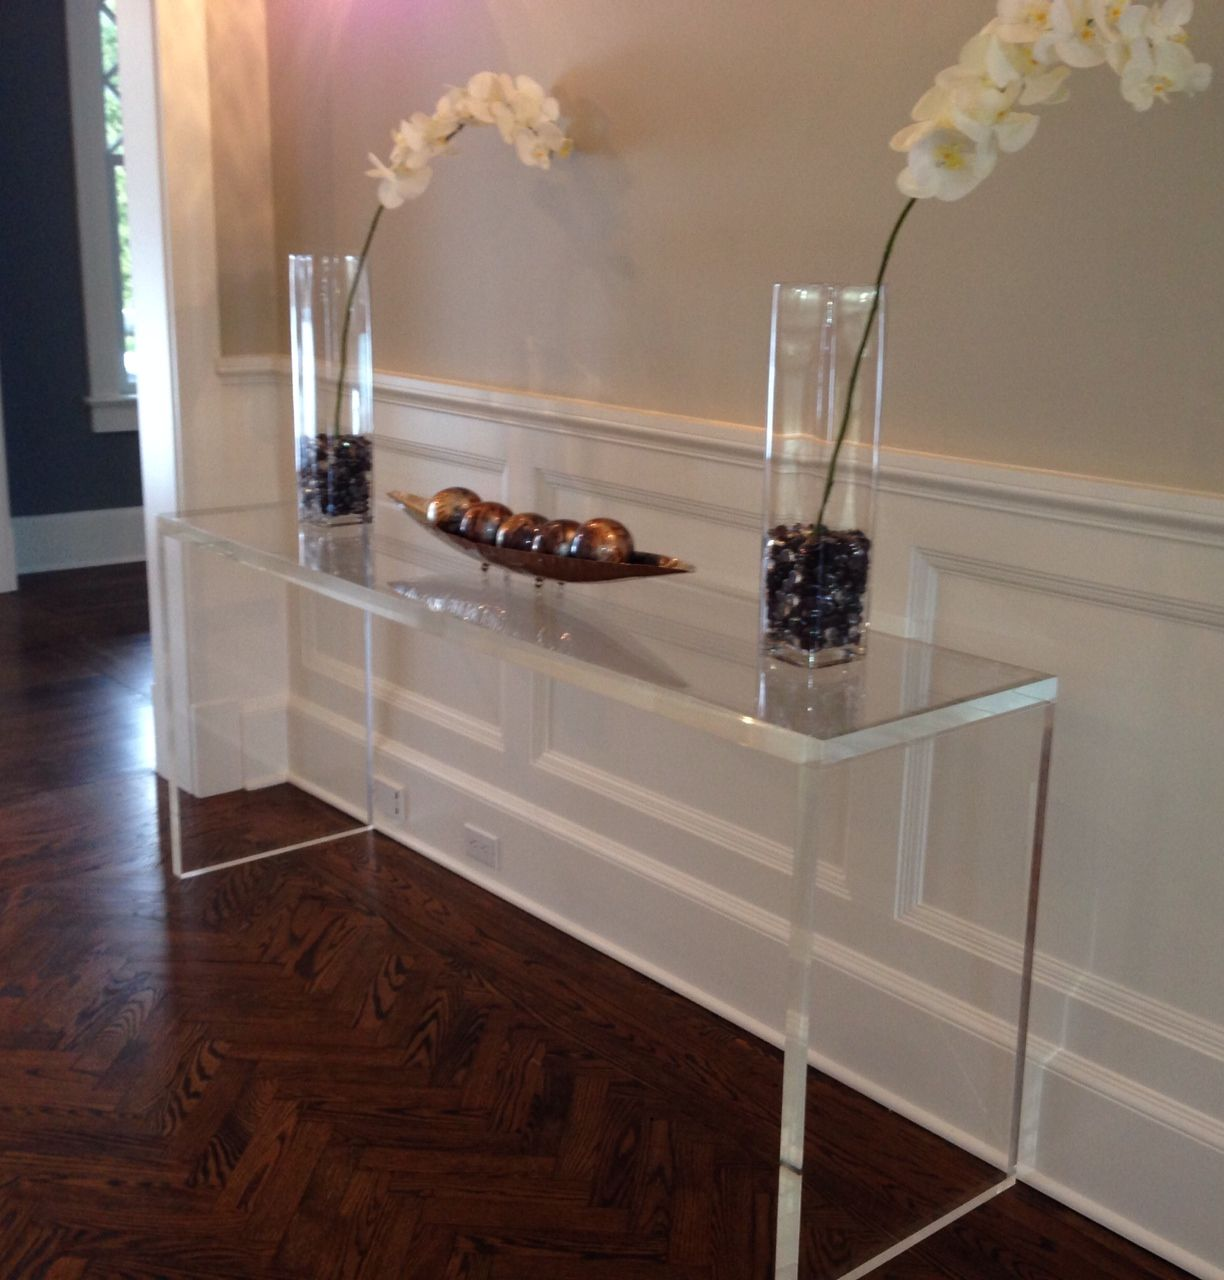 lucite acrylic furniture matt pendolino custom acrylic lucite creations by matthew james oak ridge nj acrylic furniture legs